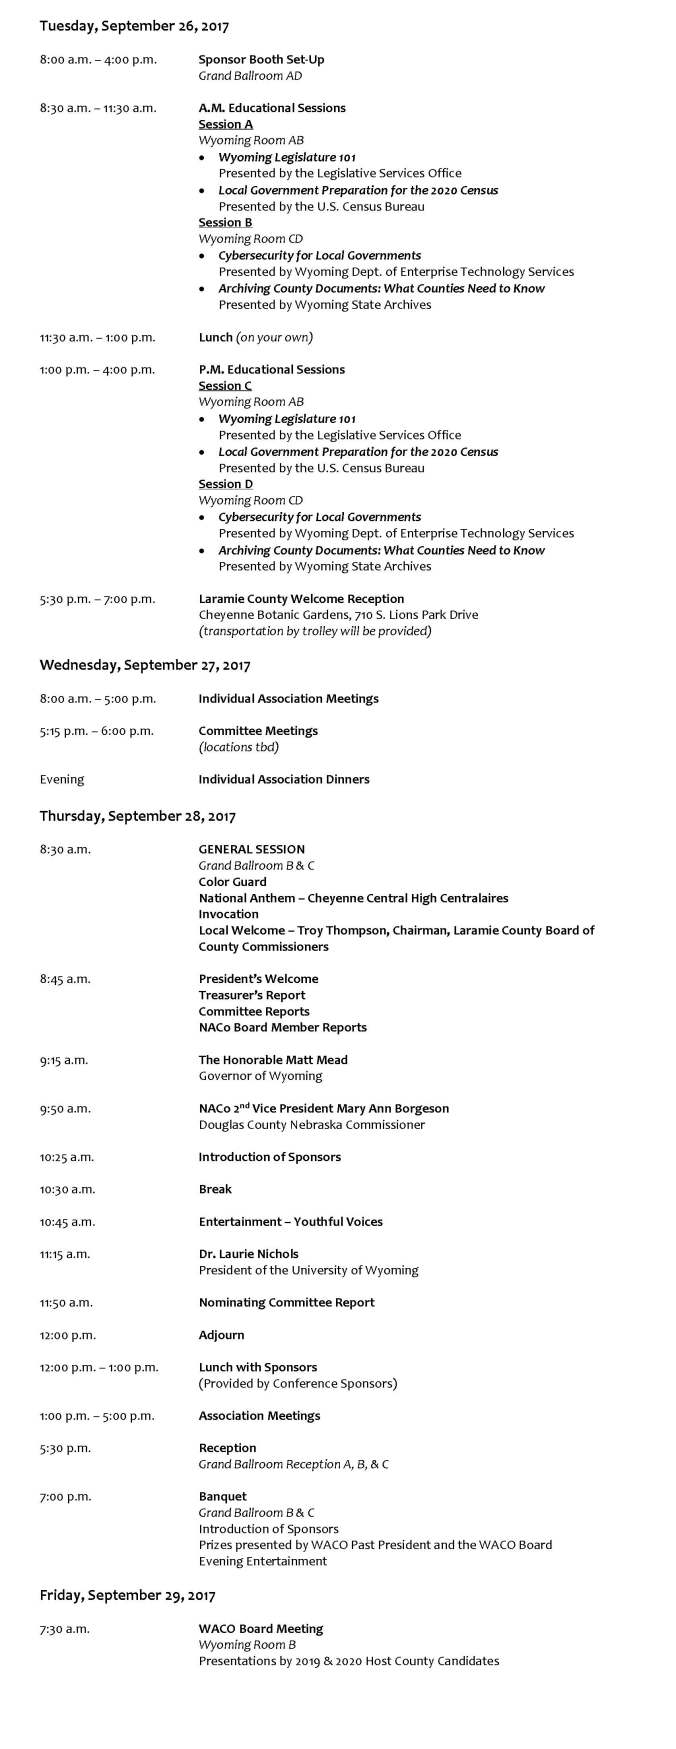 2017 WACO Conference Draft Agenda for Web